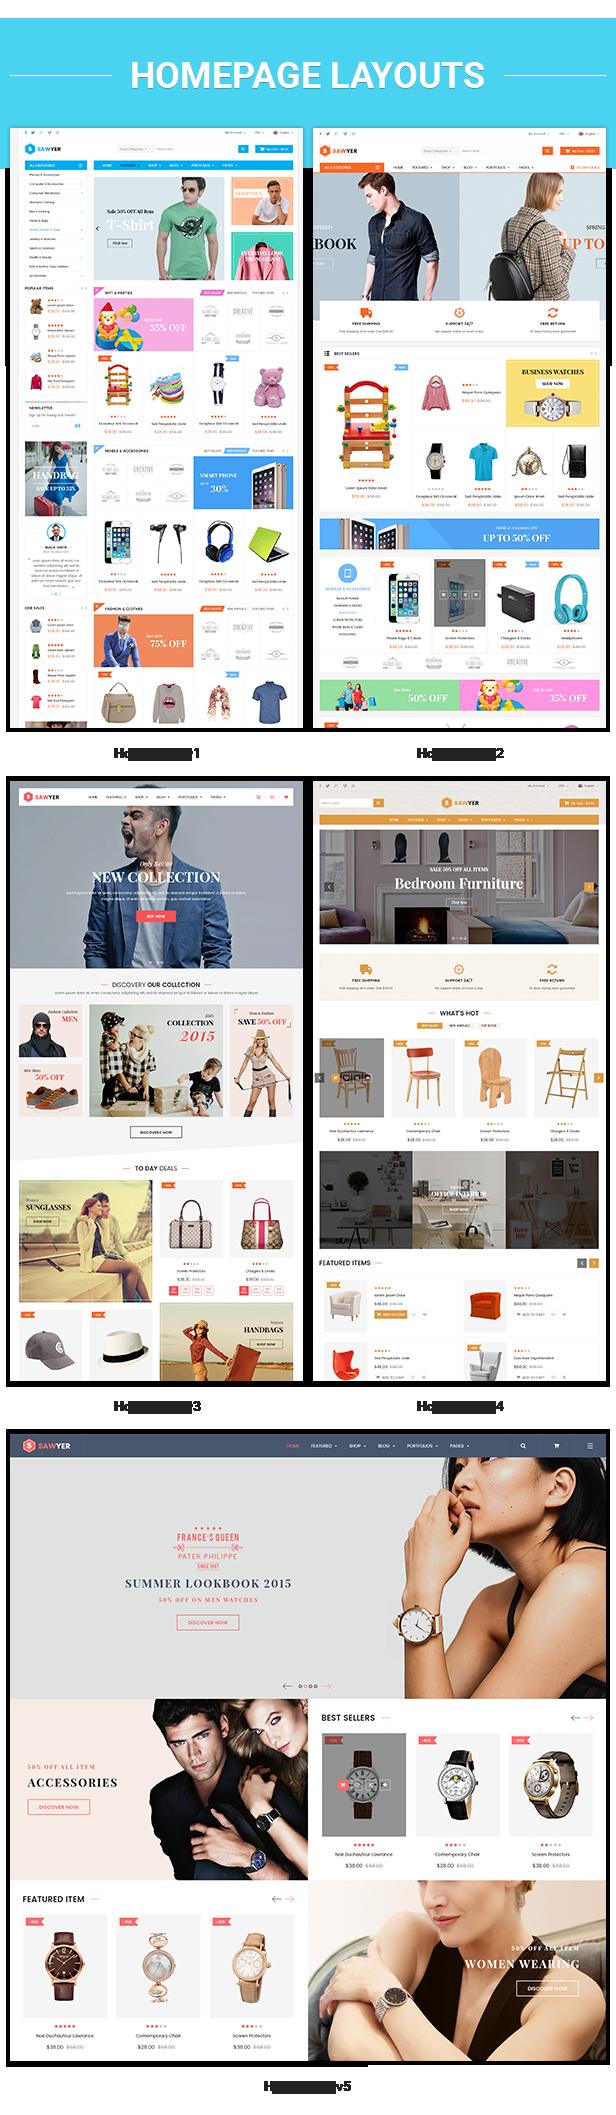 Sawyer - Homepage